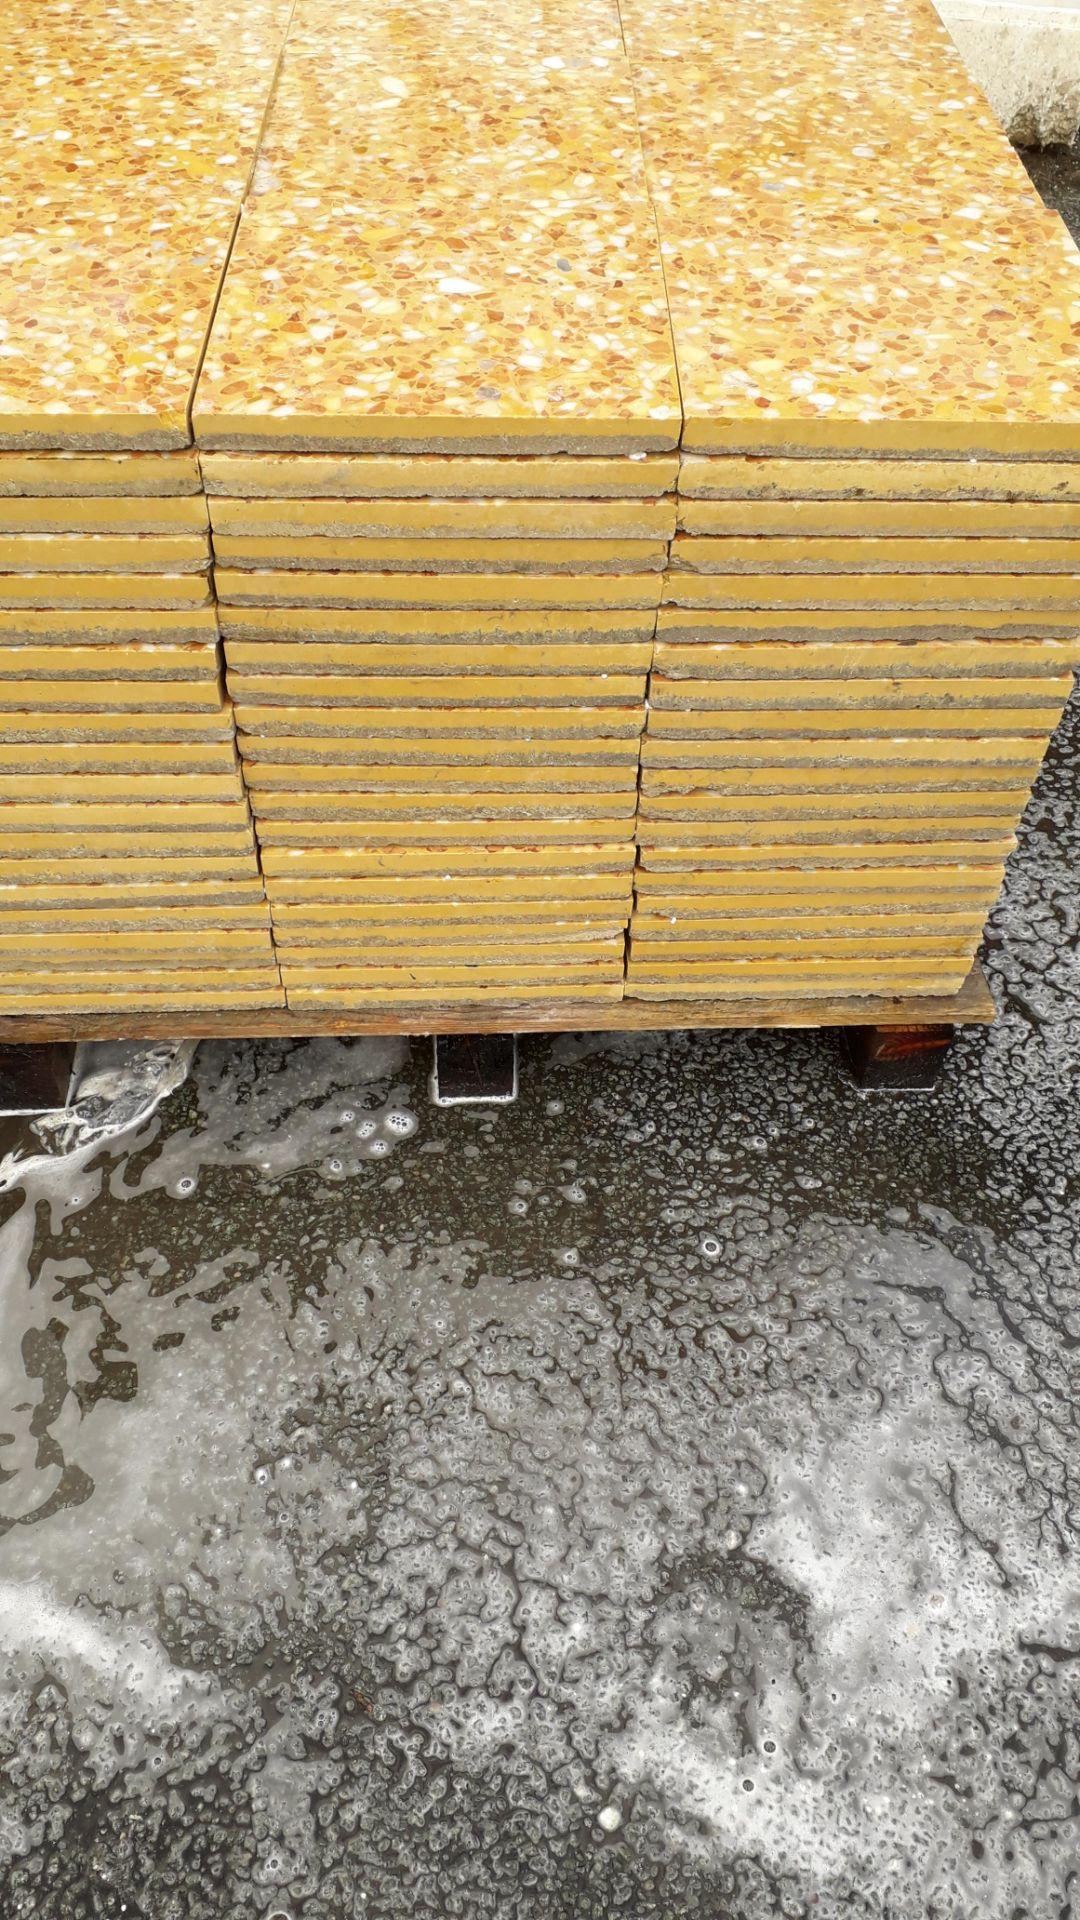 Lot 6 - 1 x pallet (L 07802) Commercial Floor Tiles - Total coverage 20 square yards